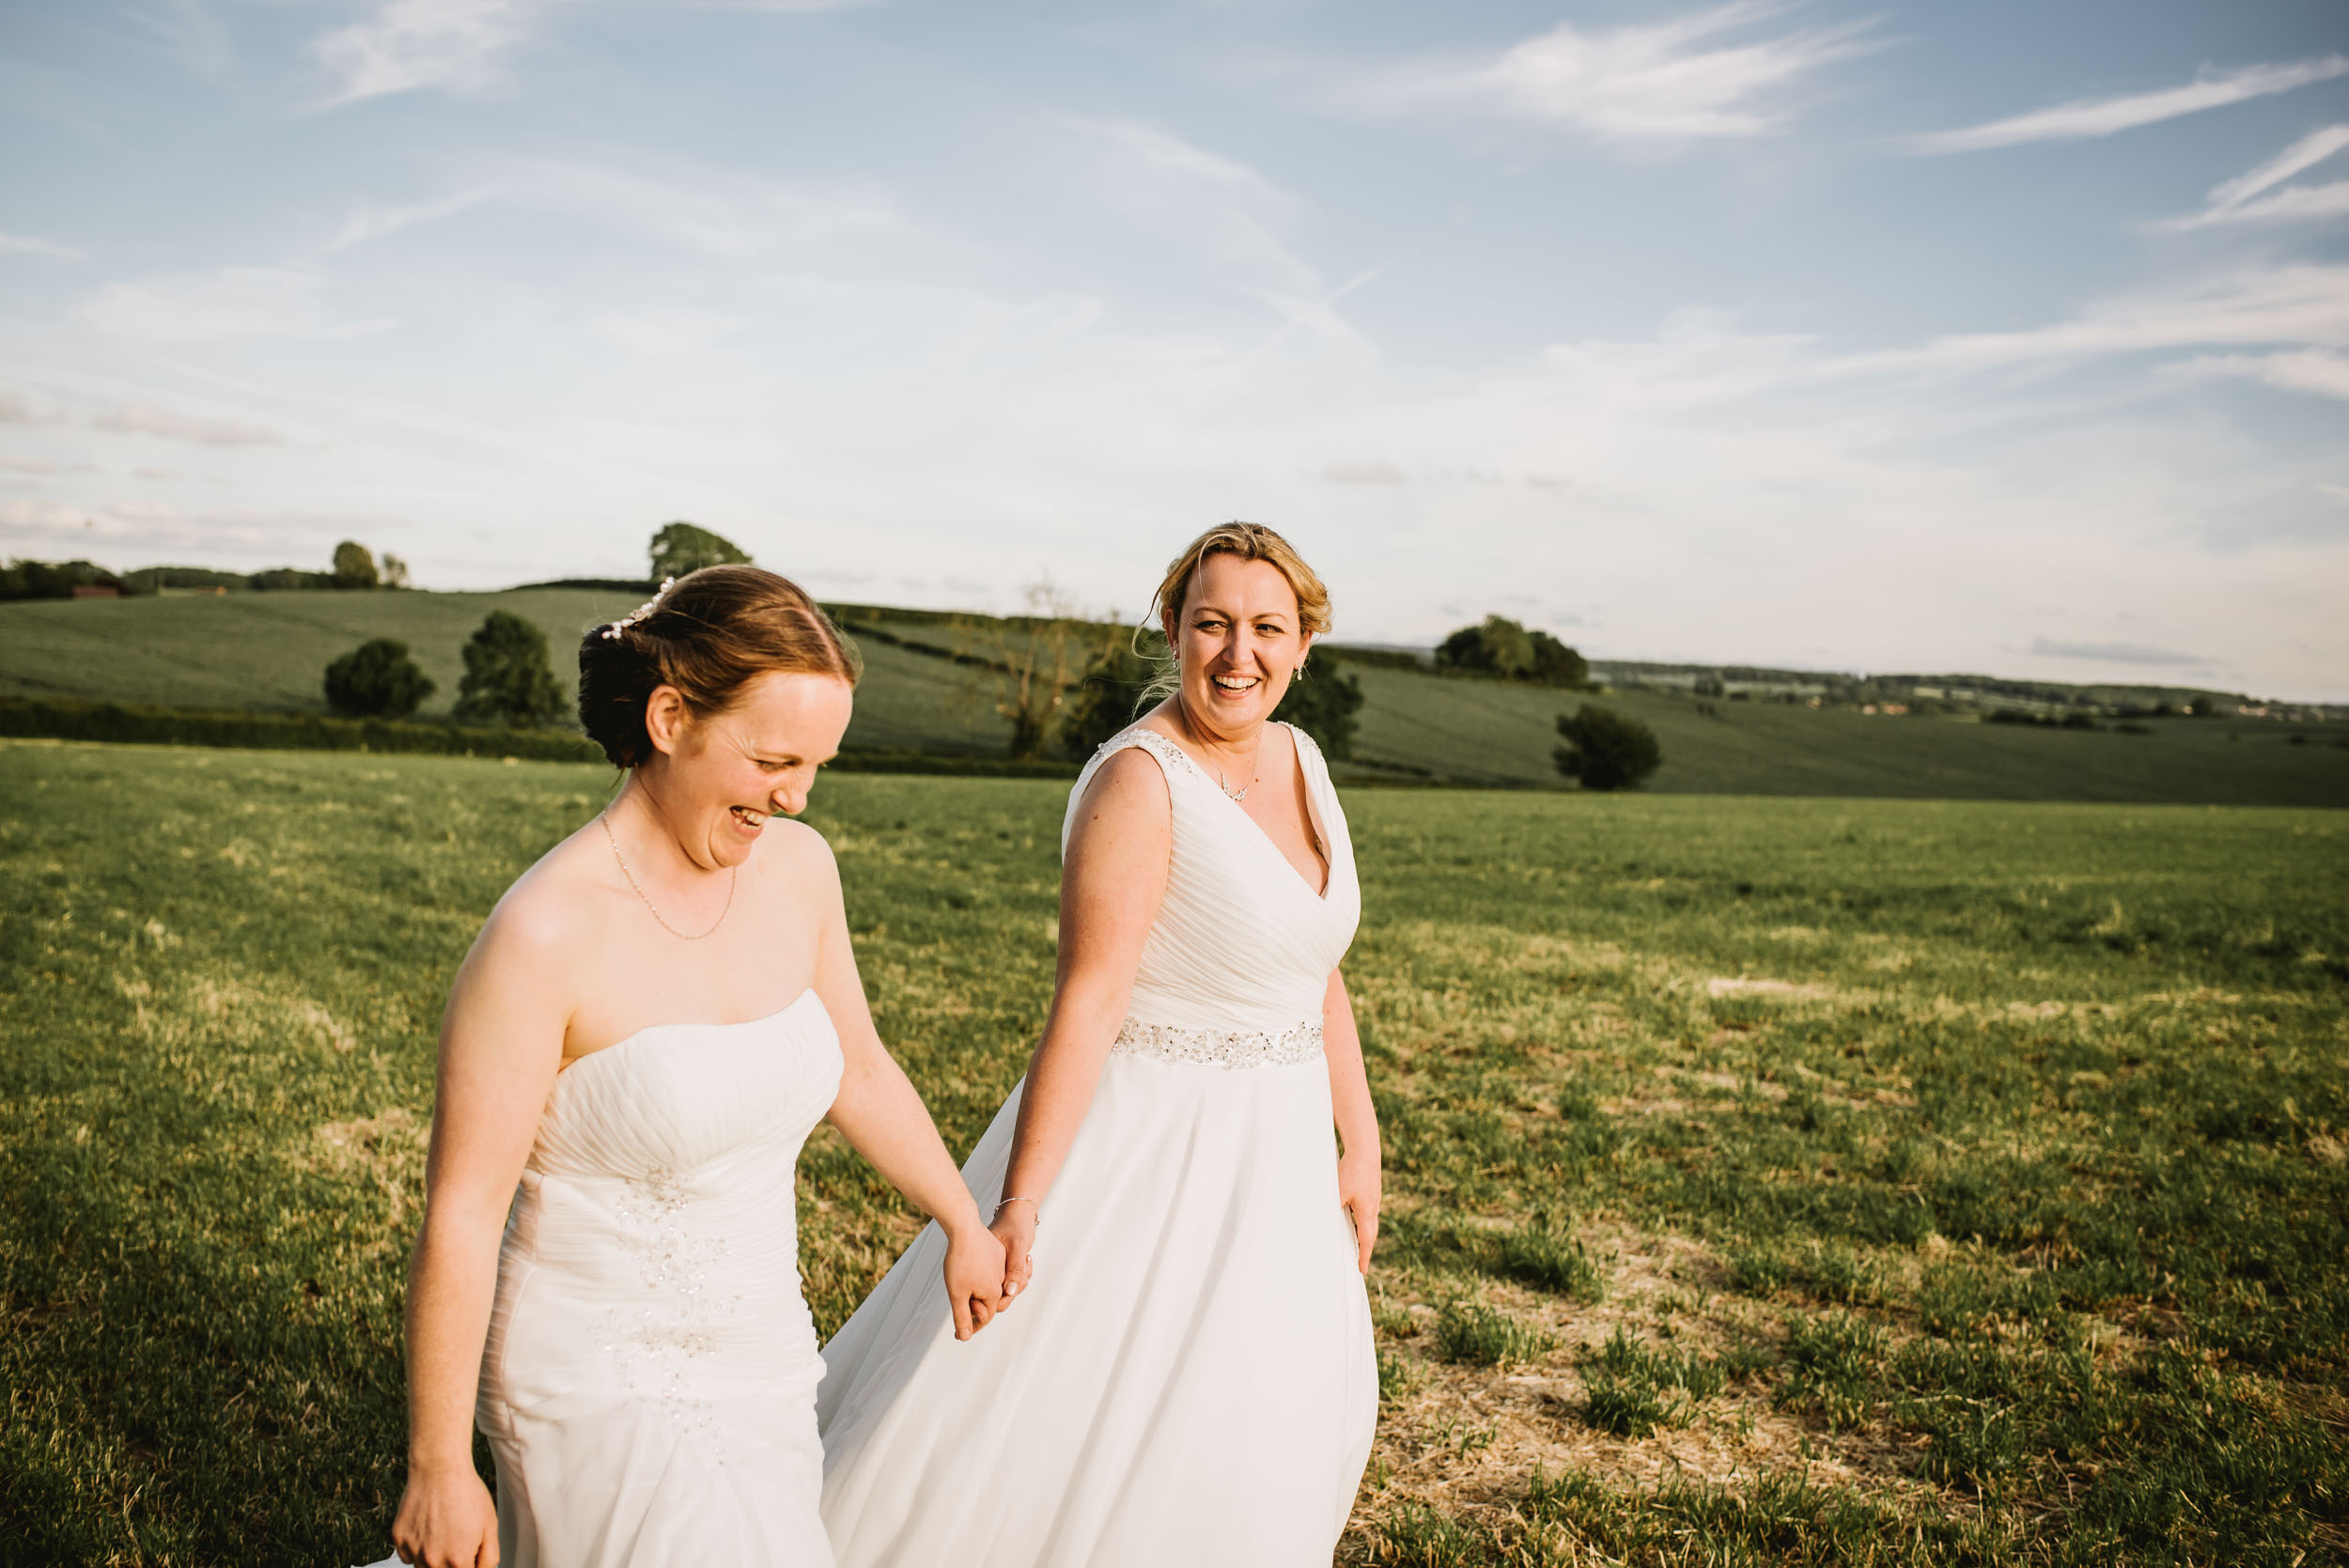 Donington-park-farm-wedding-photography-633.jpg